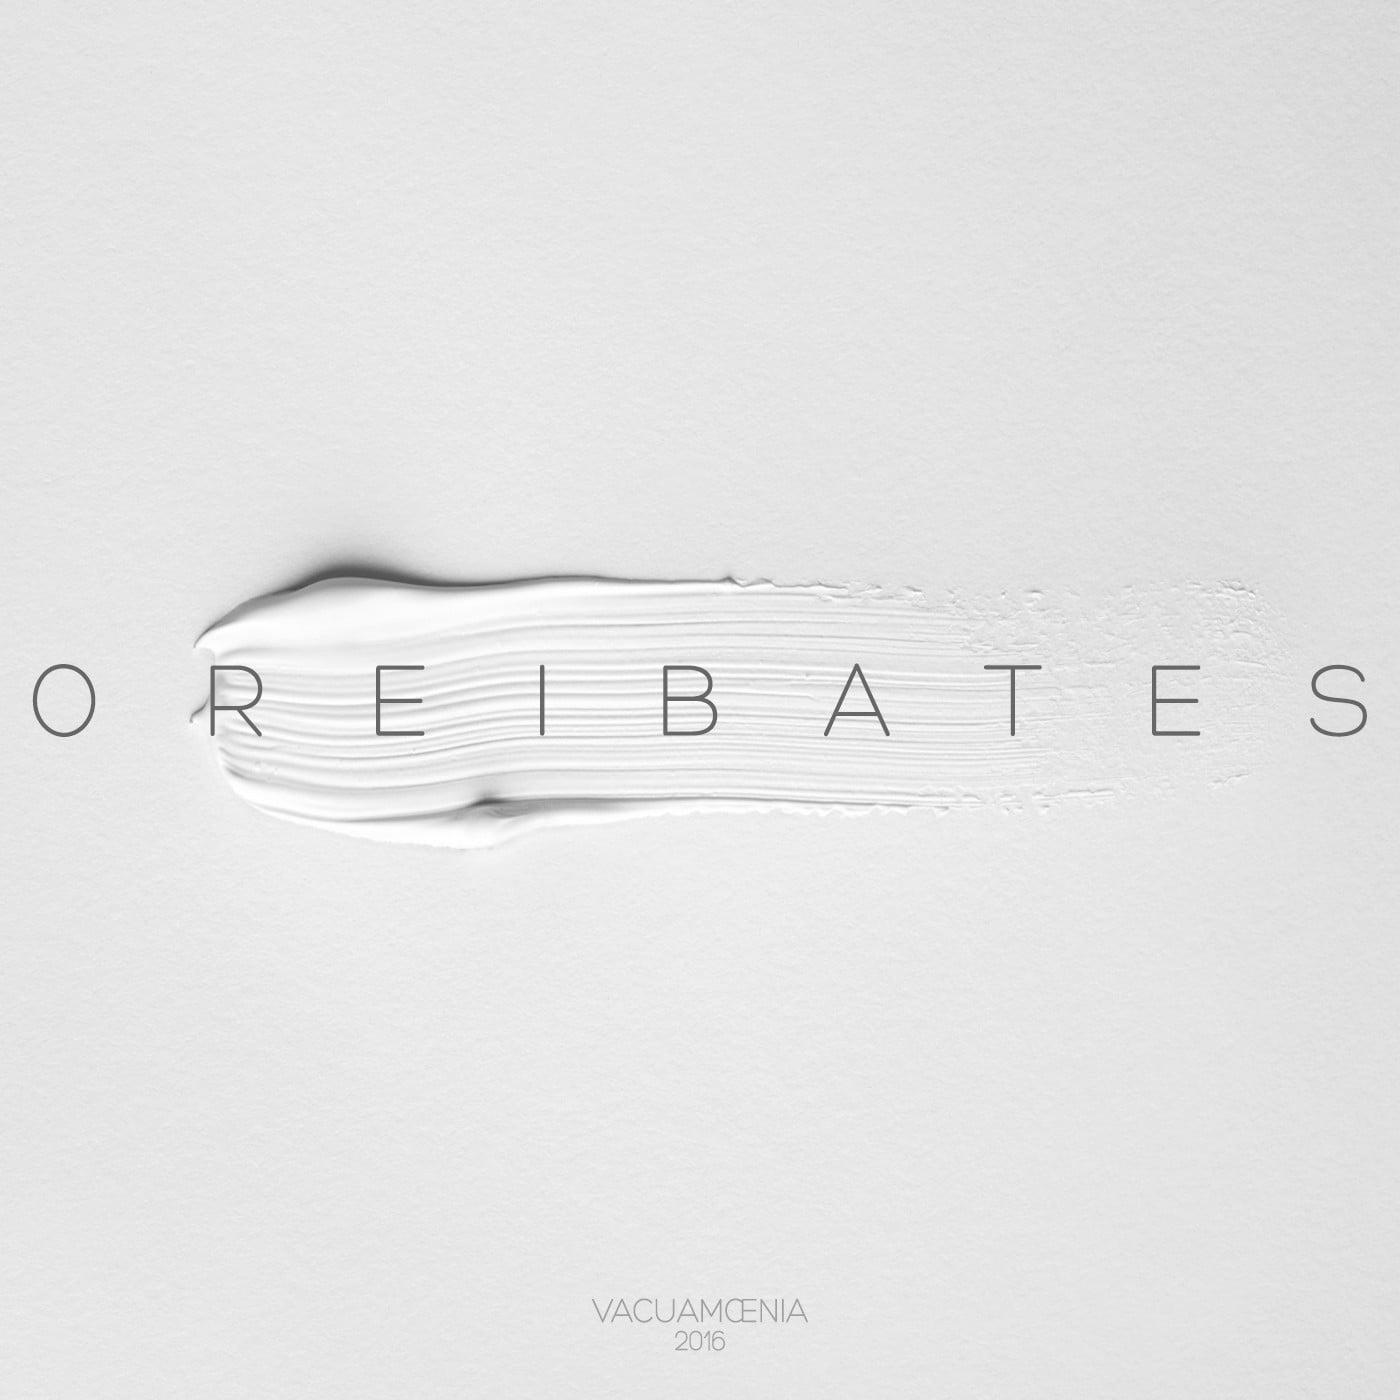 oreibates release